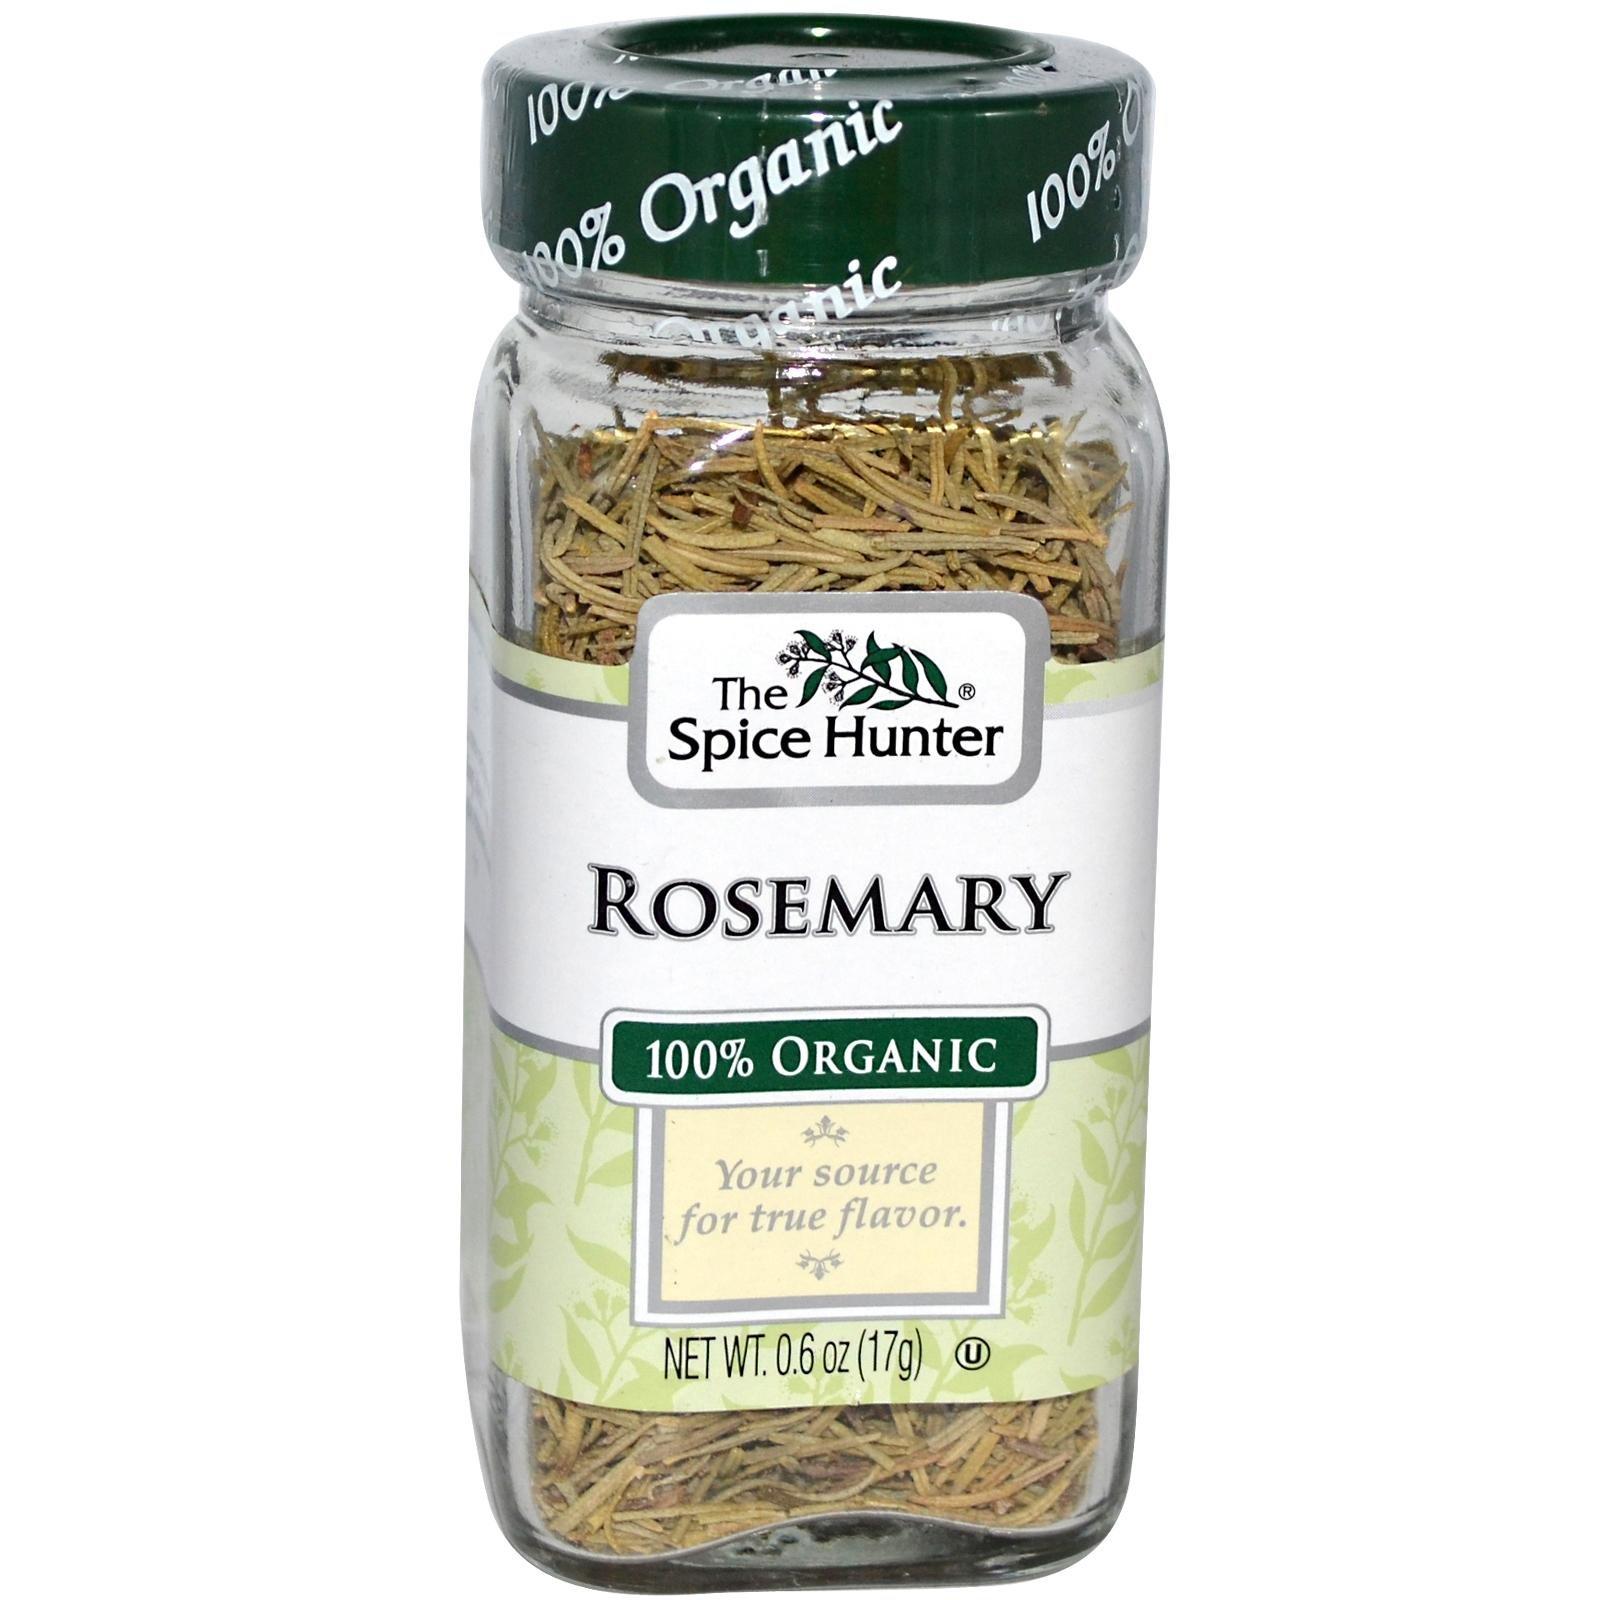 Spice Hunter Rosemary Whole Organic, 0.6 oz